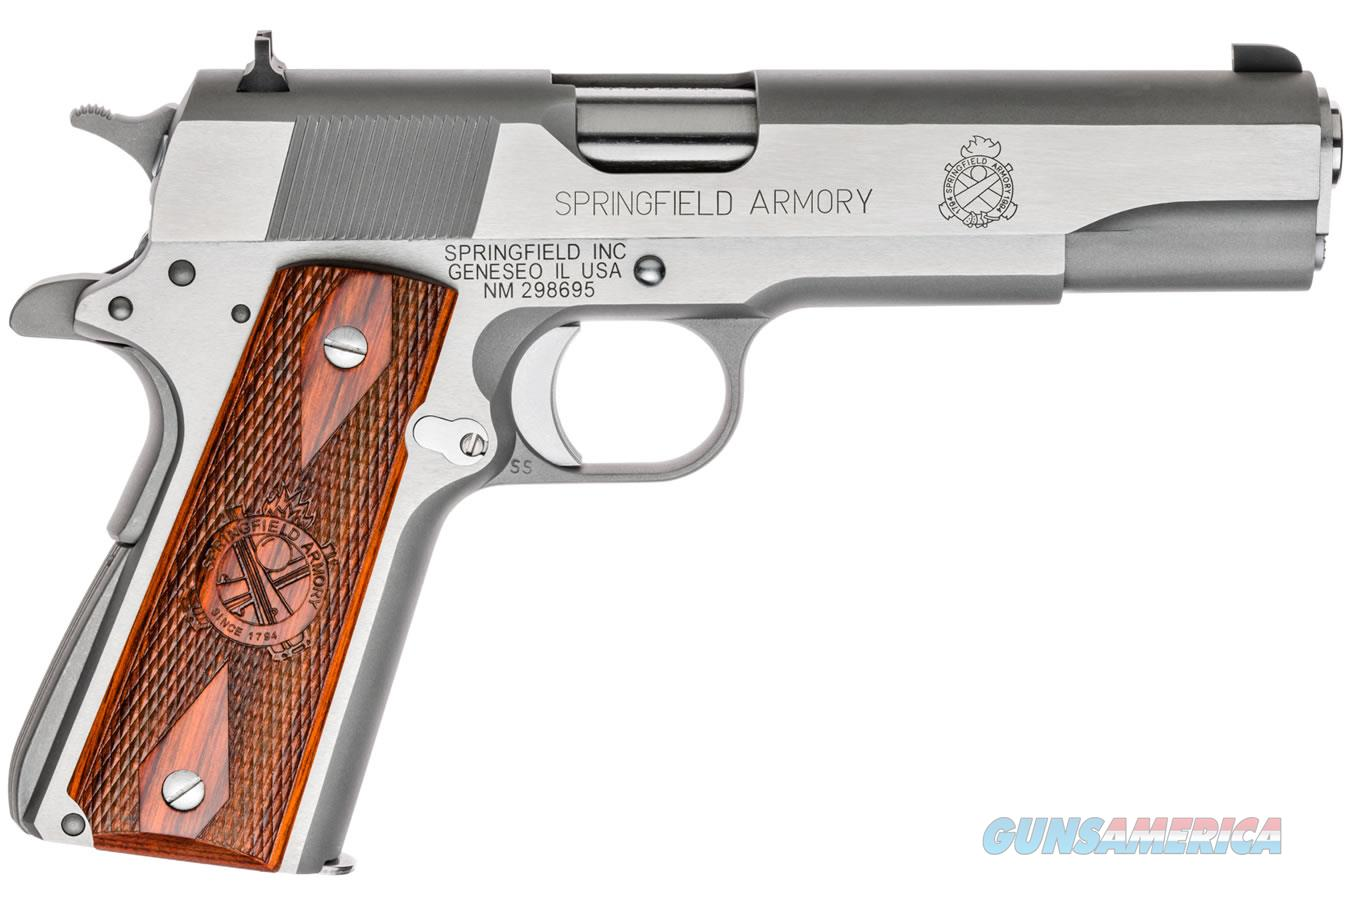 "Springfield 1911 Mil-Spec .45 ACP SS/Cocobolo  5"" PB9151L   Guns > Pistols > Springfield Armory Pistols > 1911 Type"